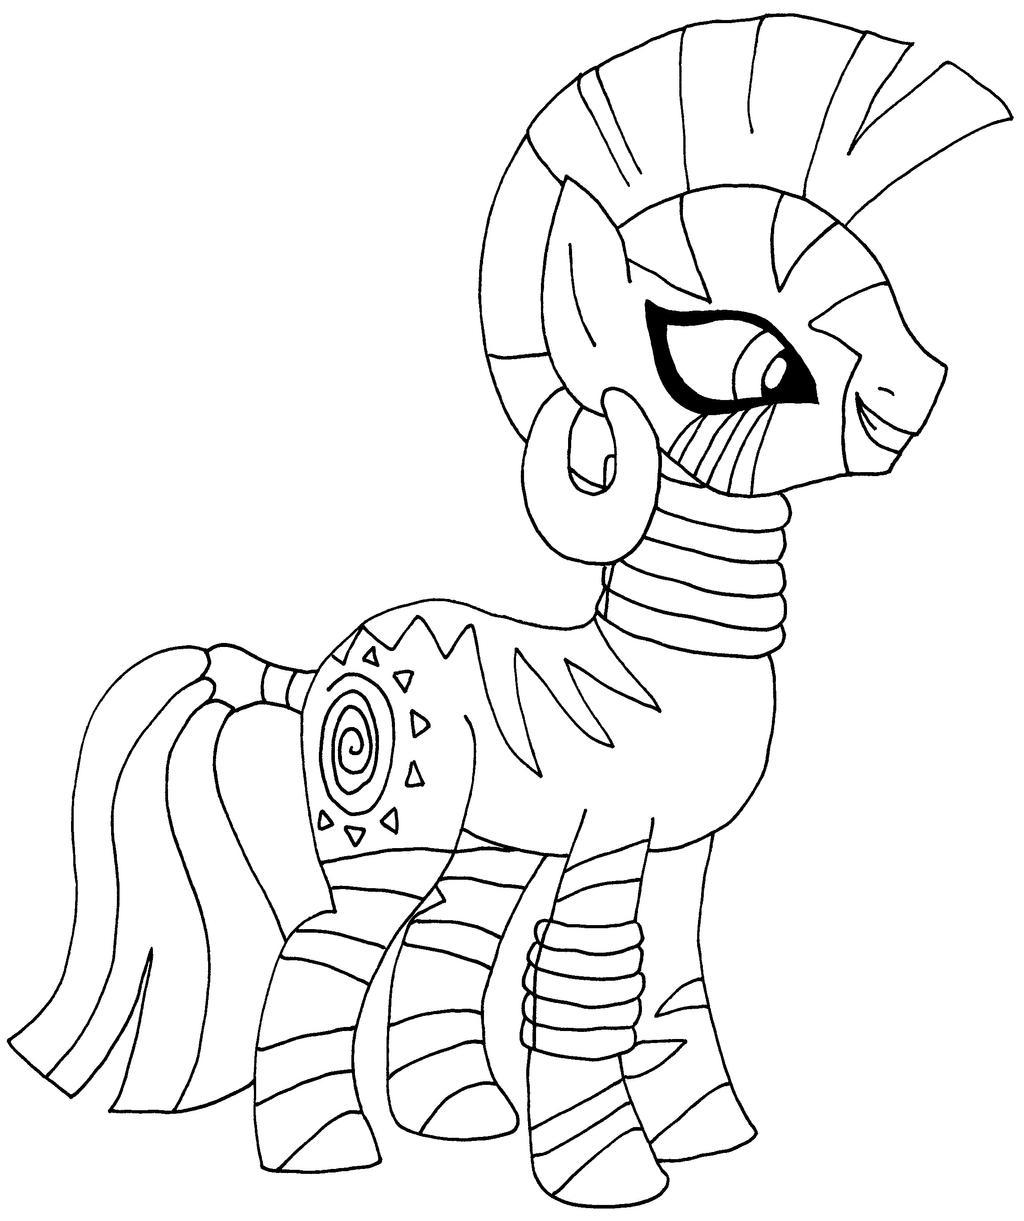 My Little Pony Zecora Coloring Pages : Zecora by elfkena on deviantart